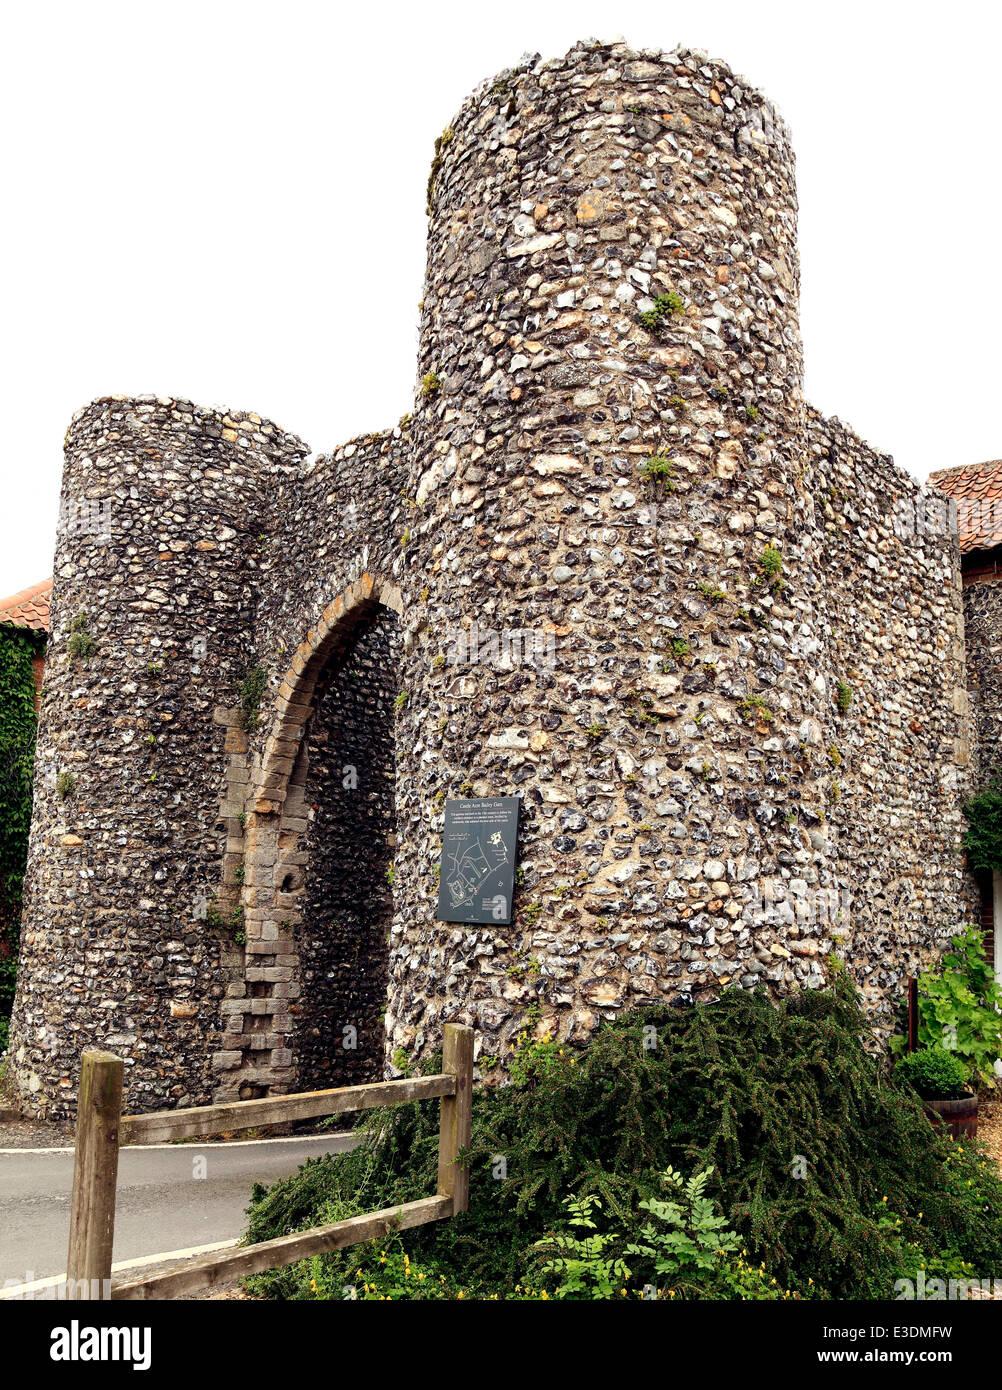 Bailey Gate, Castle Acre, Norfolk, North Norman gate, c. 1200 England UK gates medieval town defence defences - Stock Image